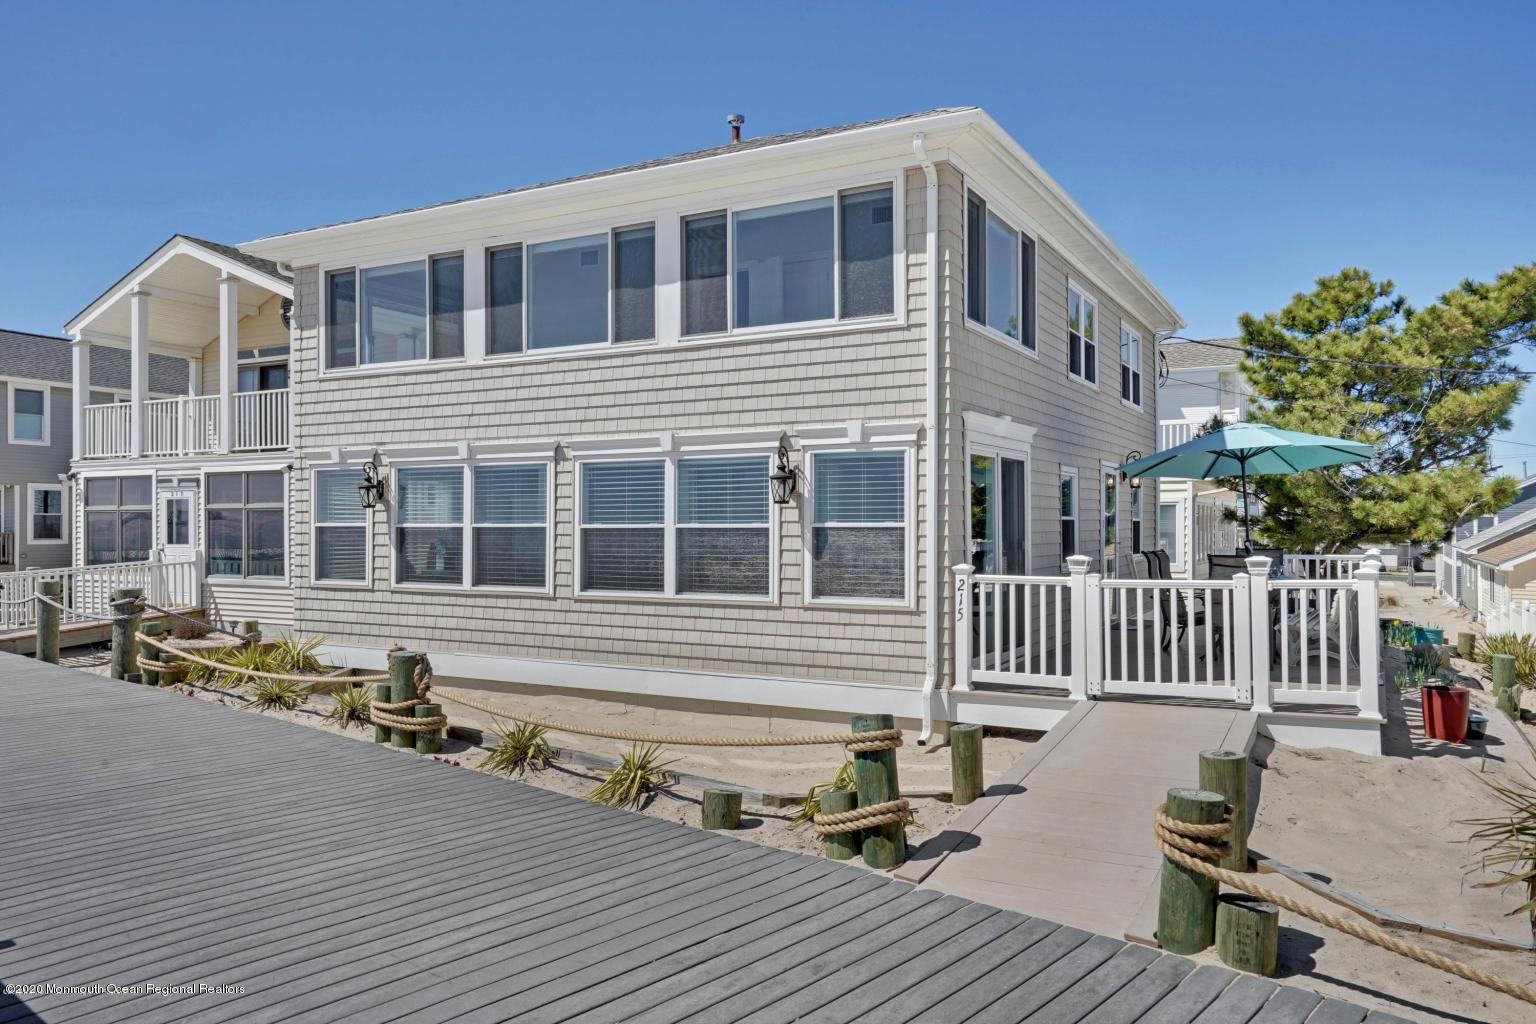 Photo of 215 Boardwalk, Point Pleasant Beach, NJ 08742